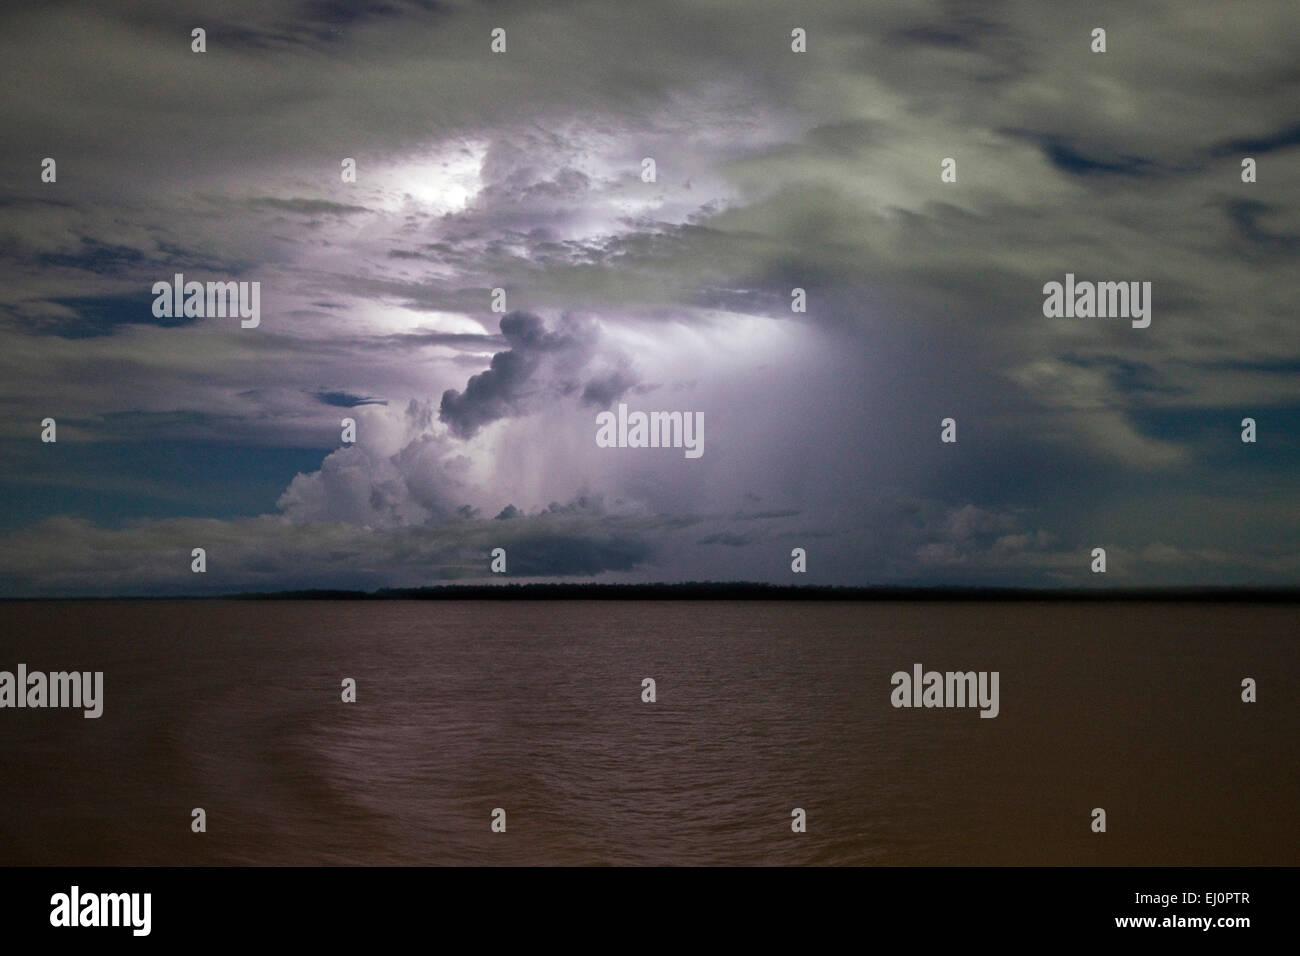 sheet lightning, storm, stormy, clouds, cloudy, lighting, lights up, night sky, Amazon River, Amazonas, Brazil, - Stock Image